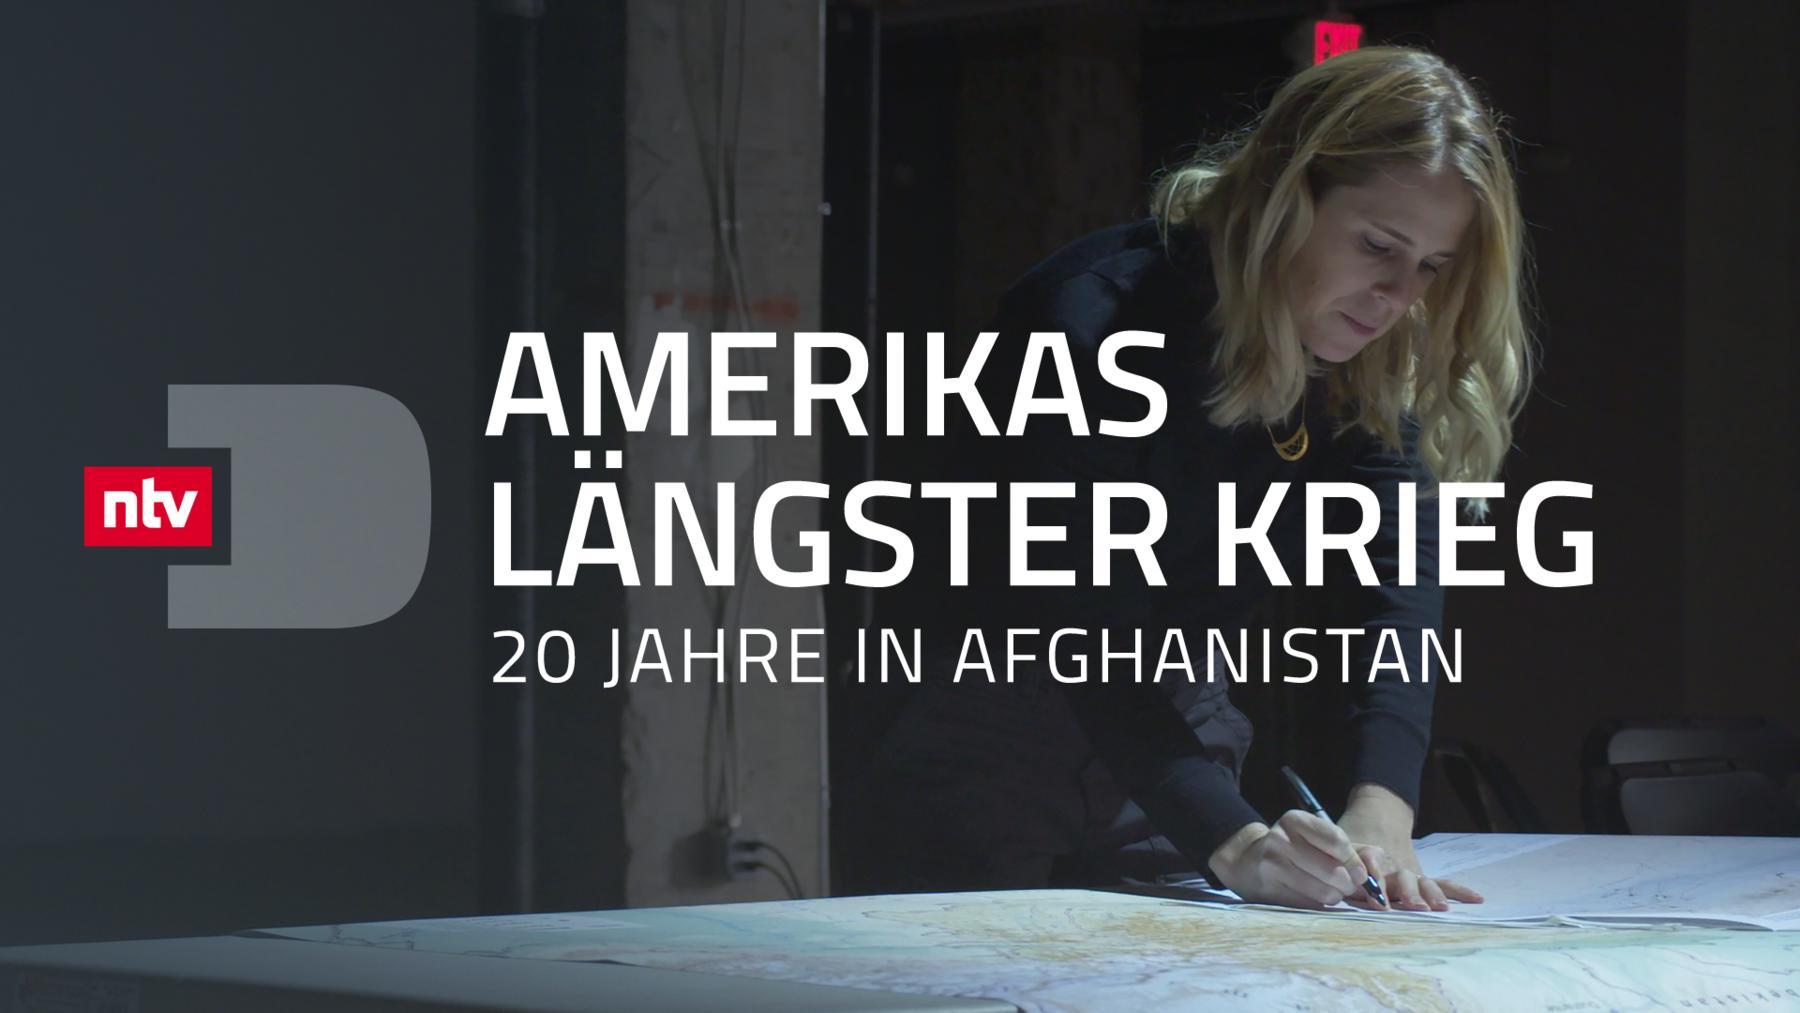 Amerikas längster Krieg - 20 Jahre in Afghanistan